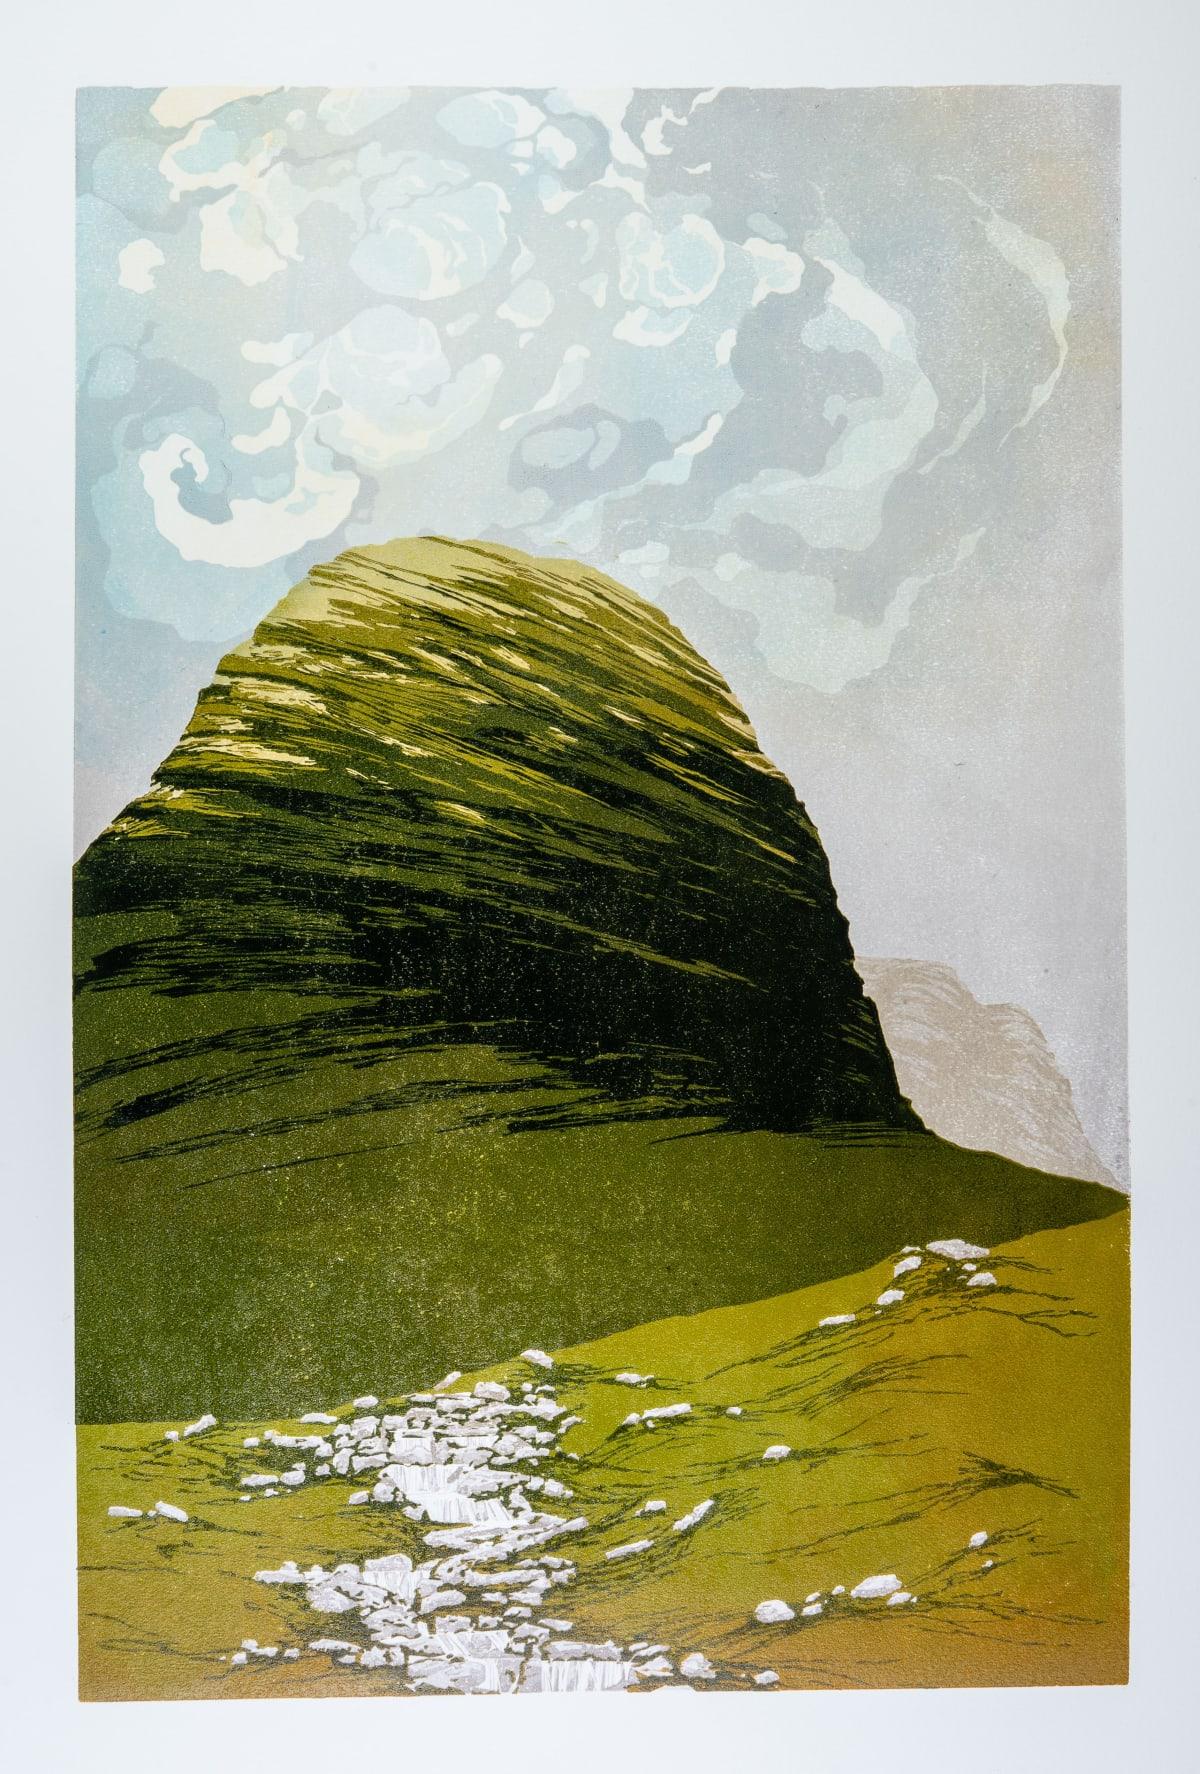 Laura Boswell Skye Light, 2018 Linocut 56 x 36.5 x 2 cm 22 1/8 x 14 3/8 x 3/4 in Edition 2 of 10